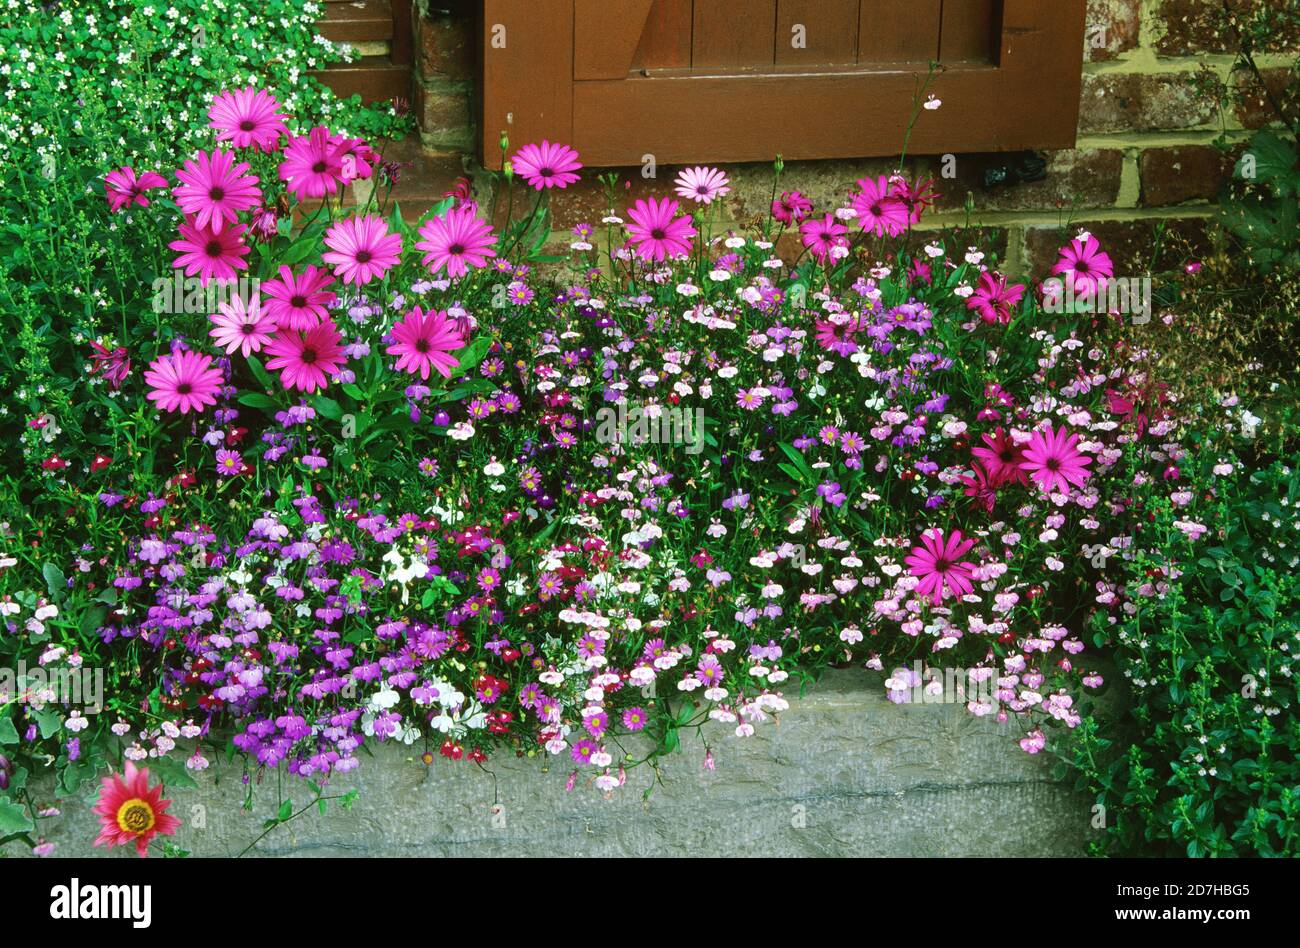 Window sill with flowers: Daisybush (Dimorphoteca sp syn. Osteospermum sp), Lobelia (Lobelia sp), Fleabane (Erigeron sp), Bacopa (Sutera sp). Private Stock Photo